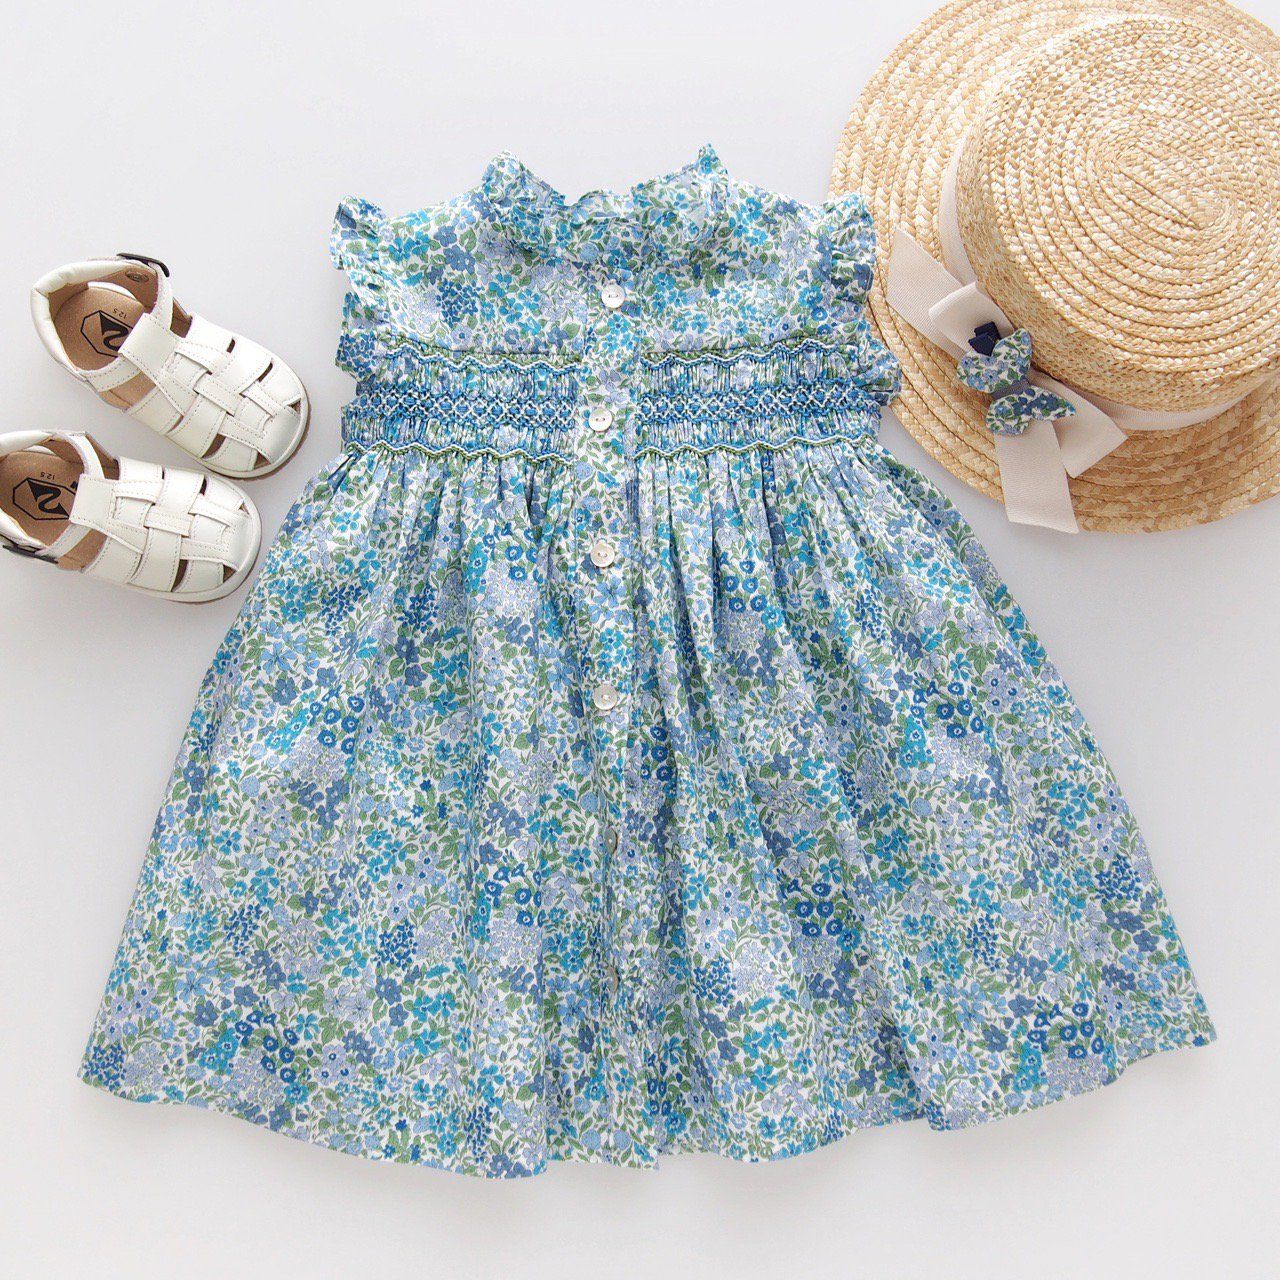 <img class='new_mark_img1' src='https://img.shop-pro.jp/img/new/icons1.gif' style='border:none;display:inline;margin:0px;padding:0px;width:auto;' />Amaia Kids - Hydrangea dress (Liberty blue)